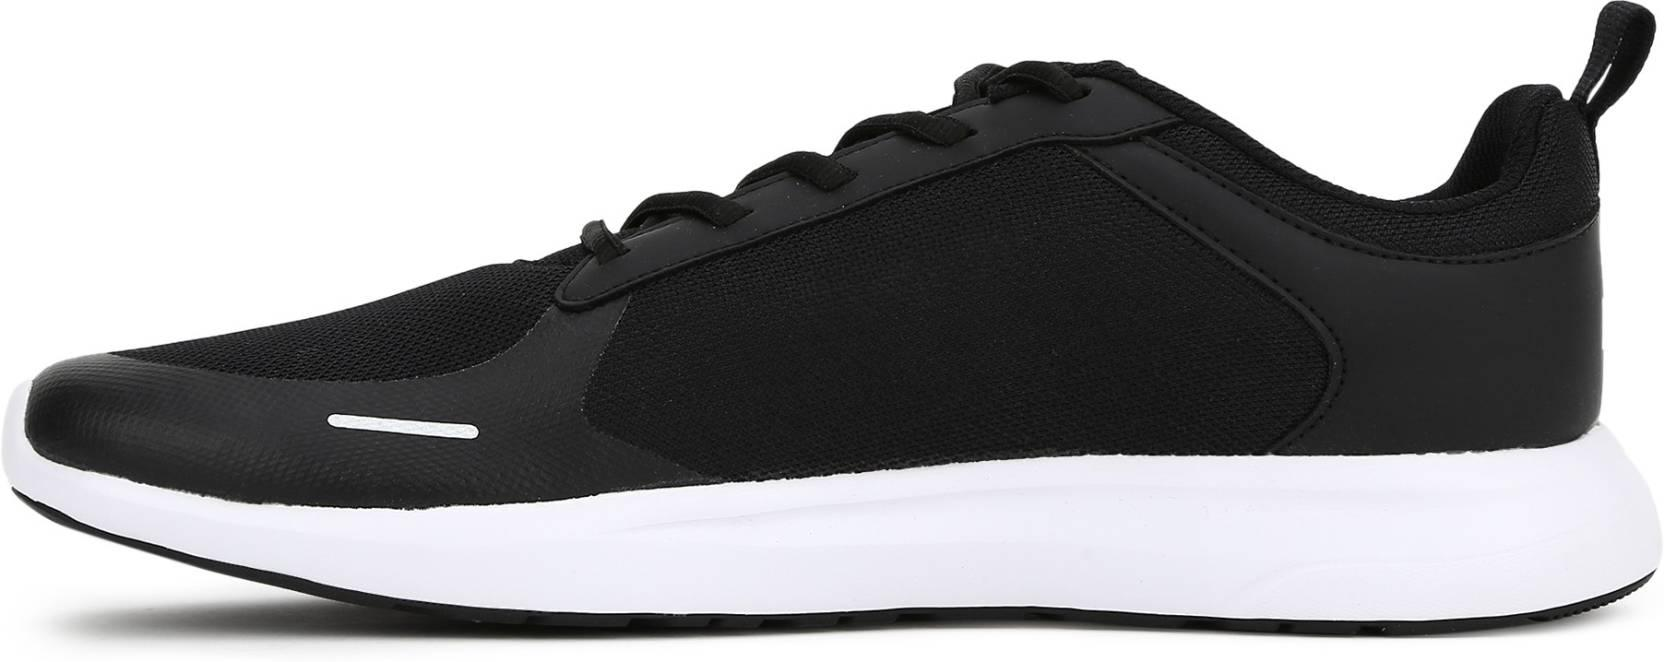 PumaJaunt IDP Running Shoes For Men(Black)